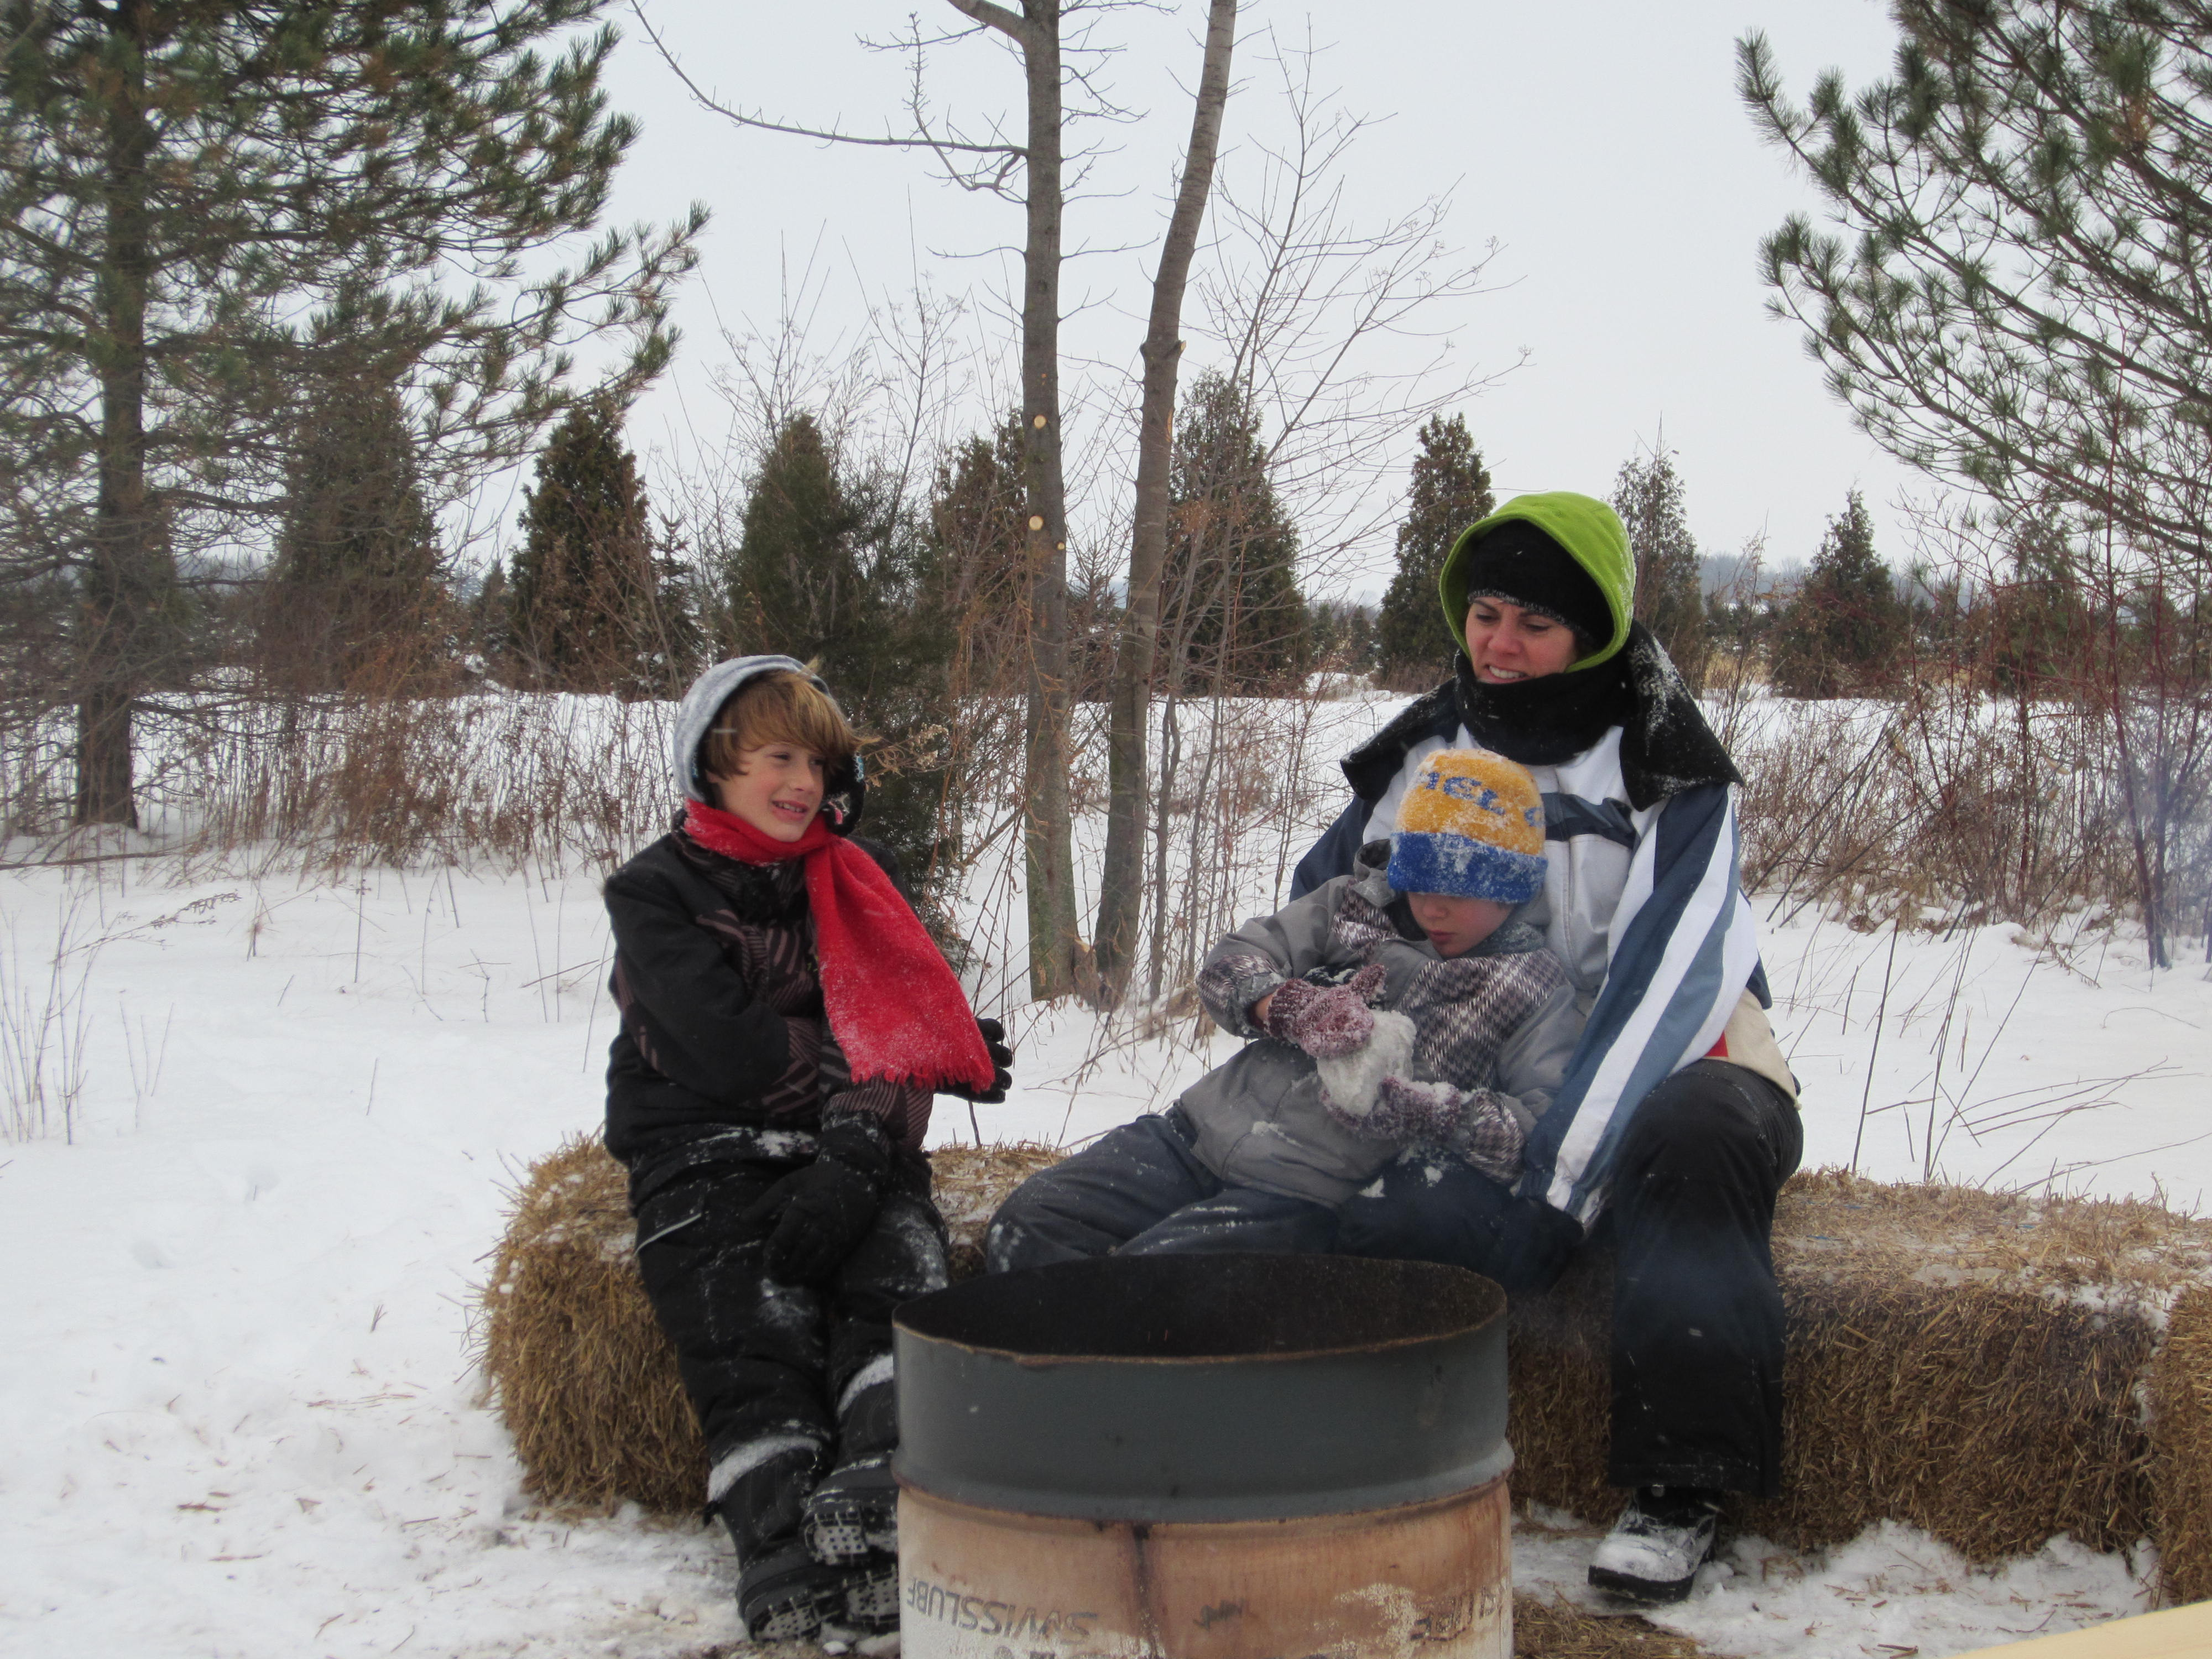 Enjoy a campfire